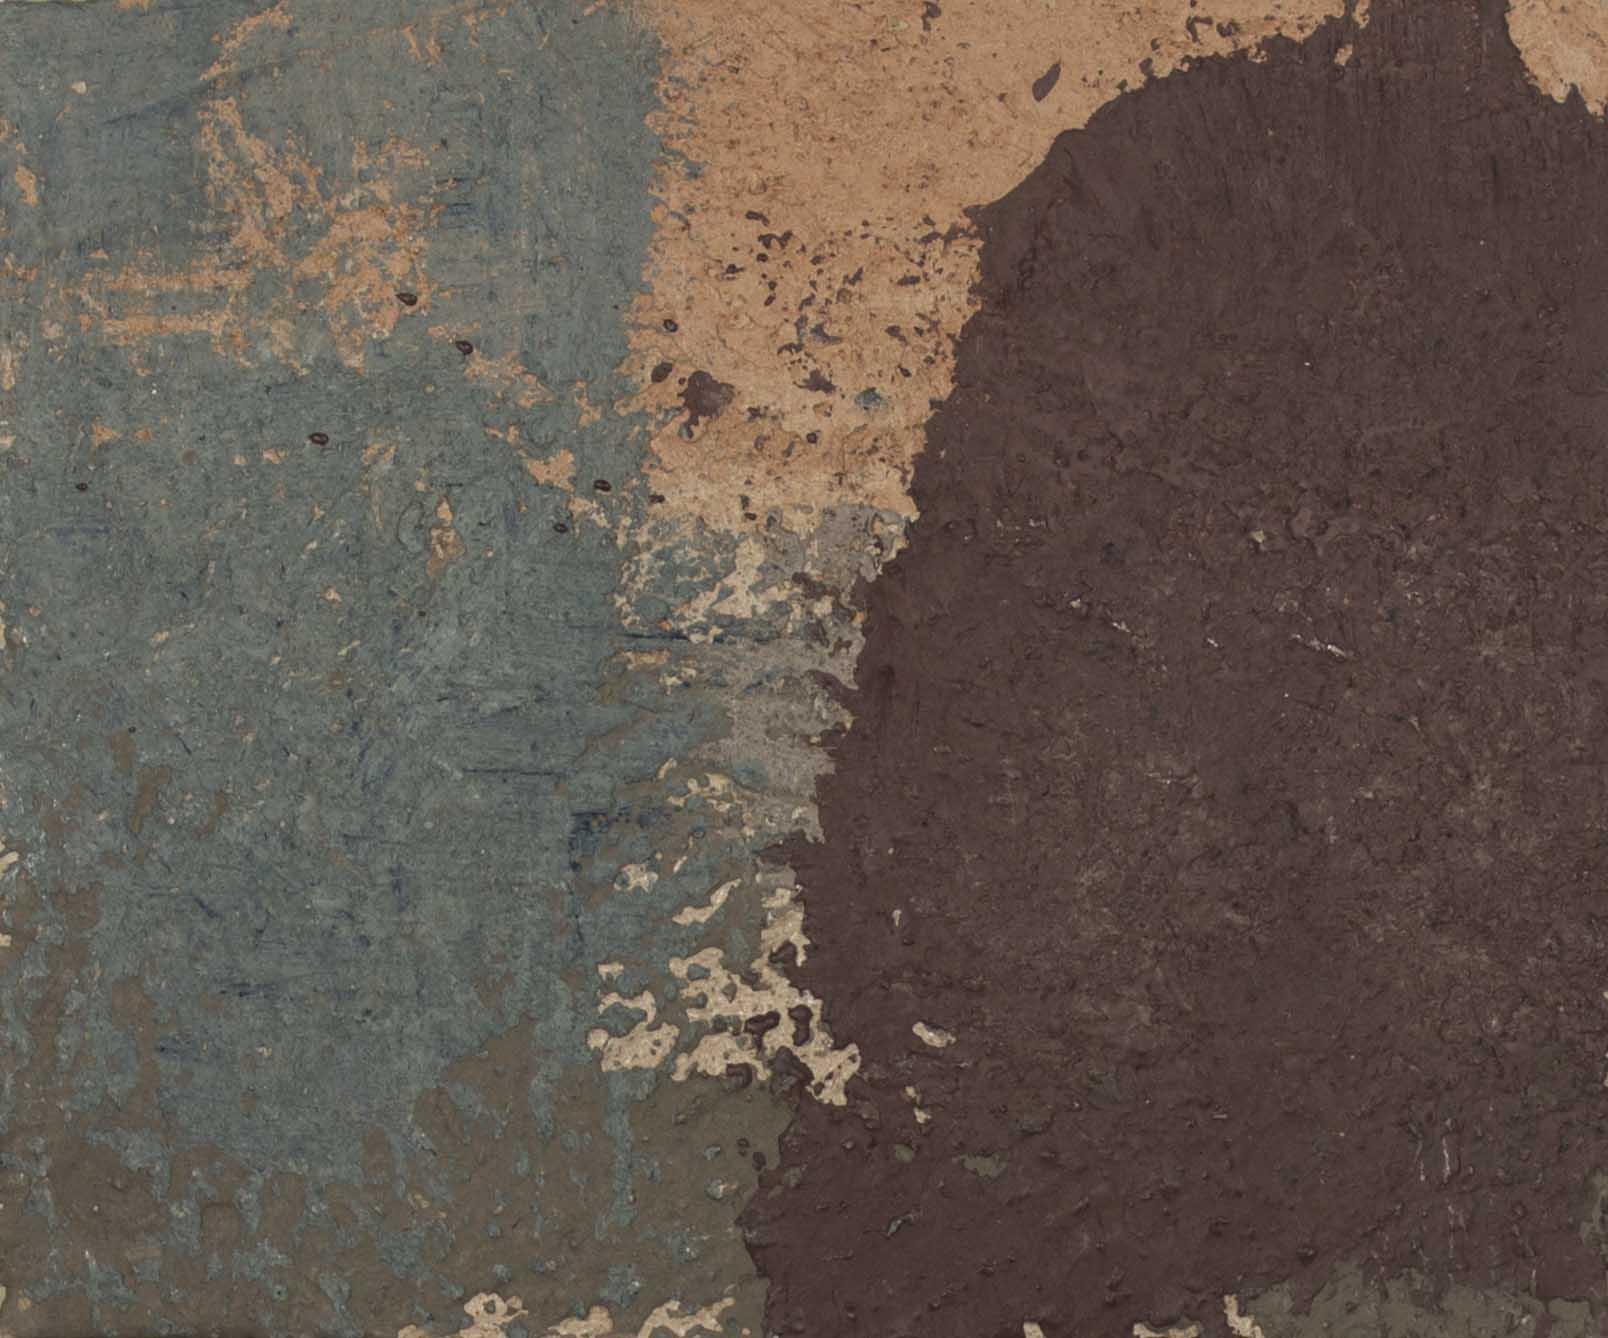 "Mixed Media on handmade plaster  12"" x 16"" 2018"